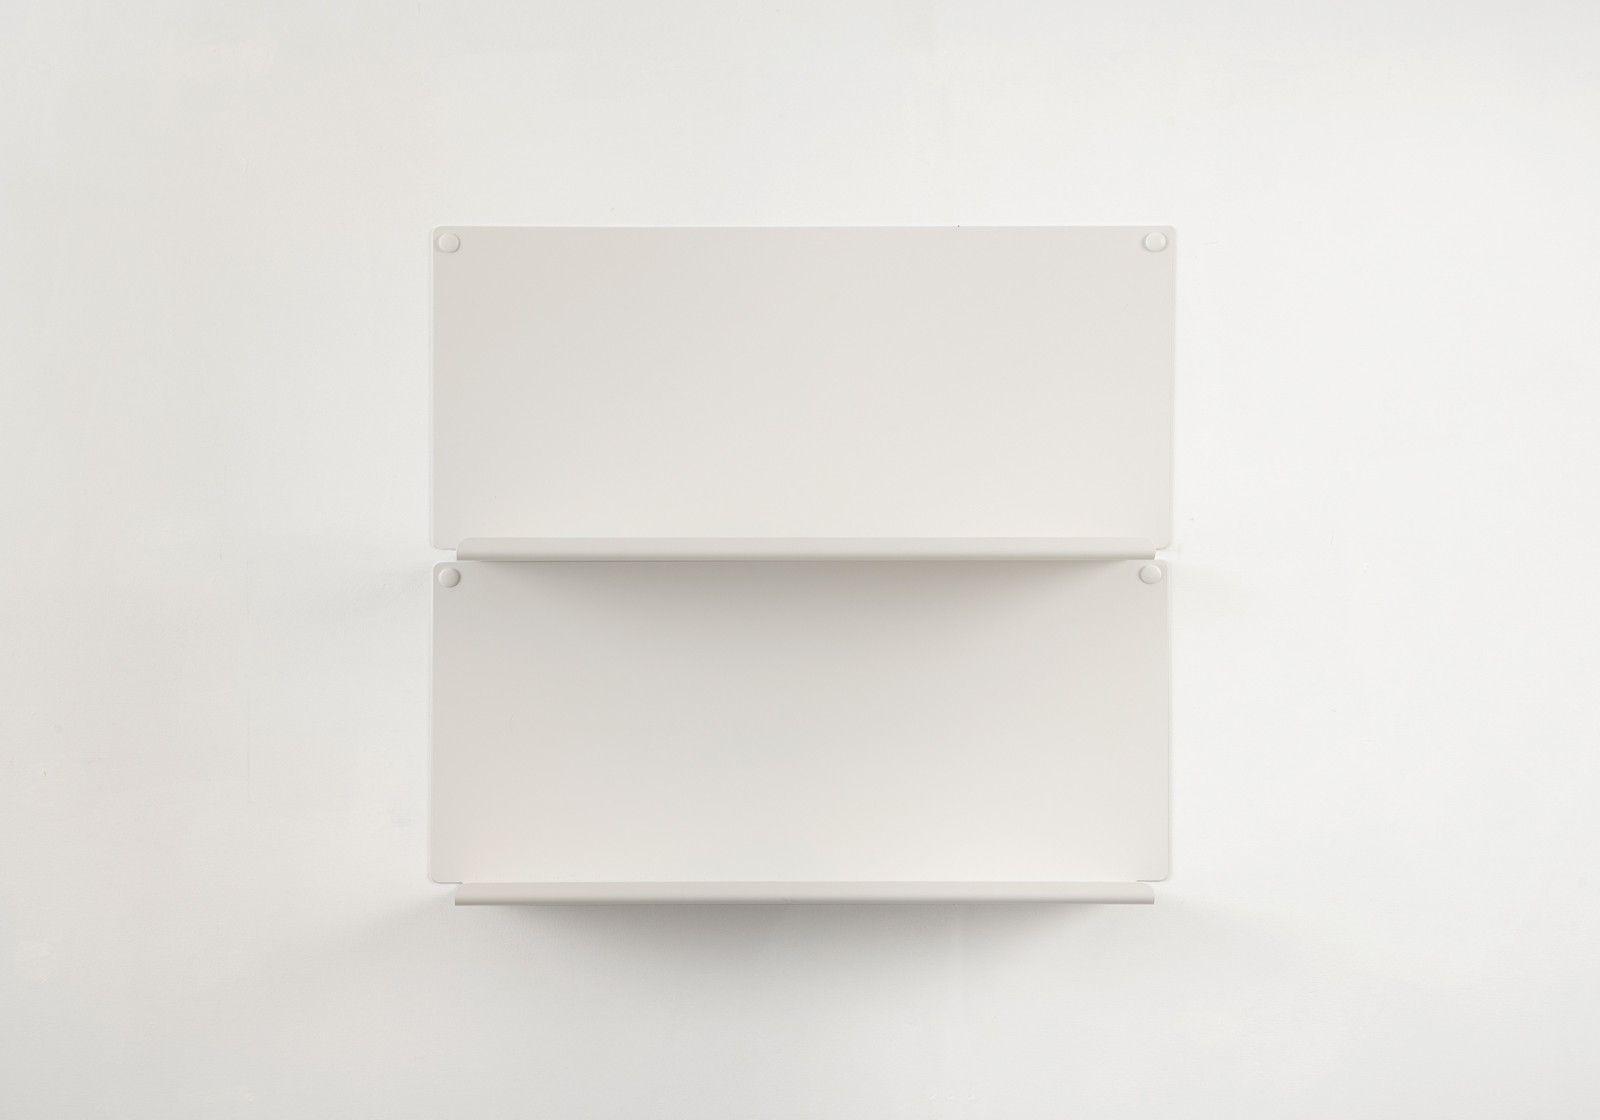 tag re cadres photo le lot de 2 45x10 cm blanc. Black Bedroom Furniture Sets. Home Design Ideas